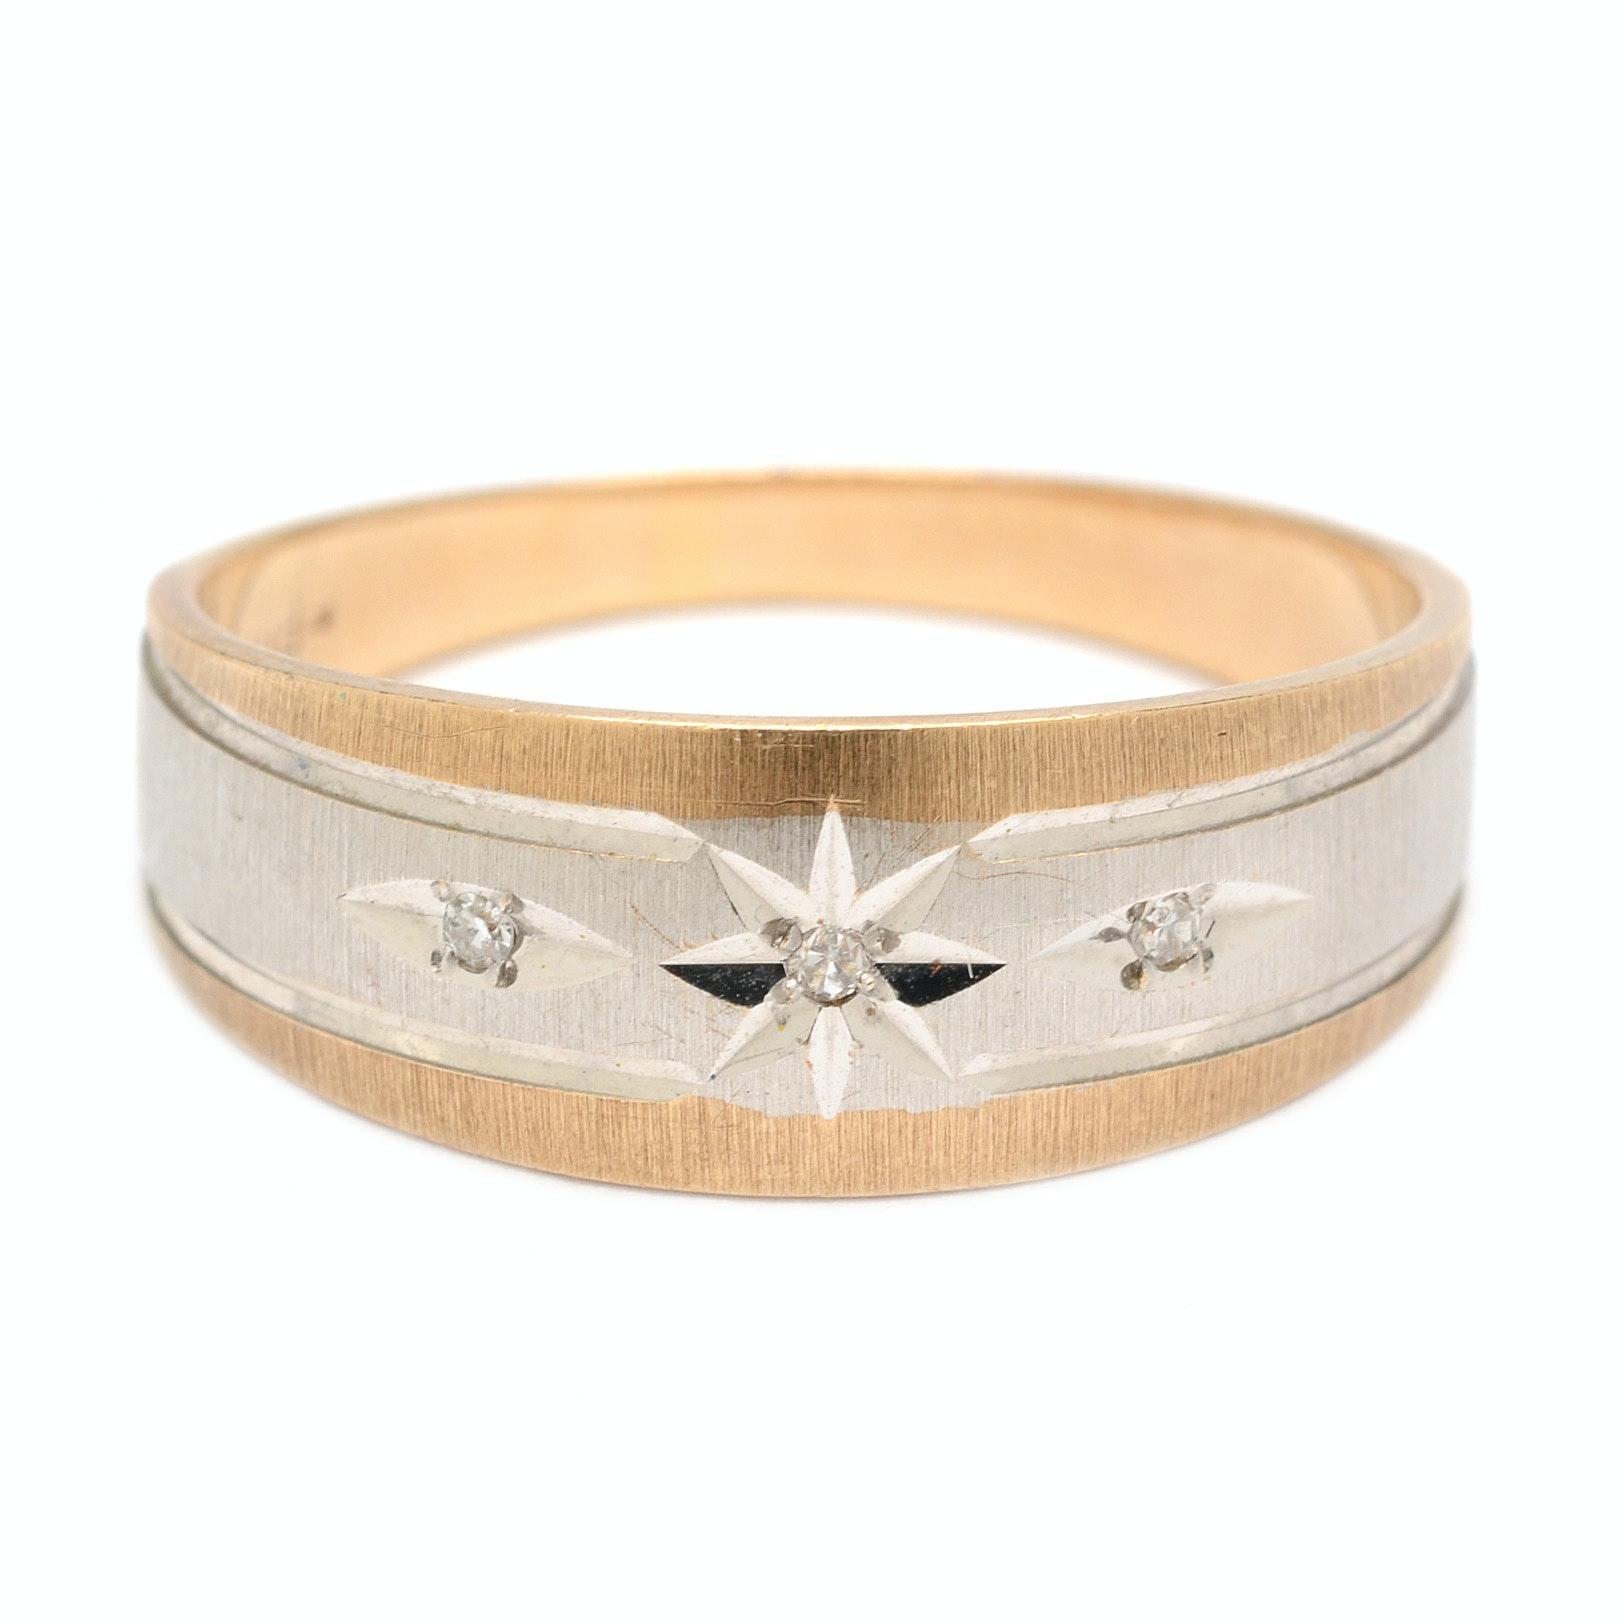 10K Yellow Gold and Diamond Ring Band